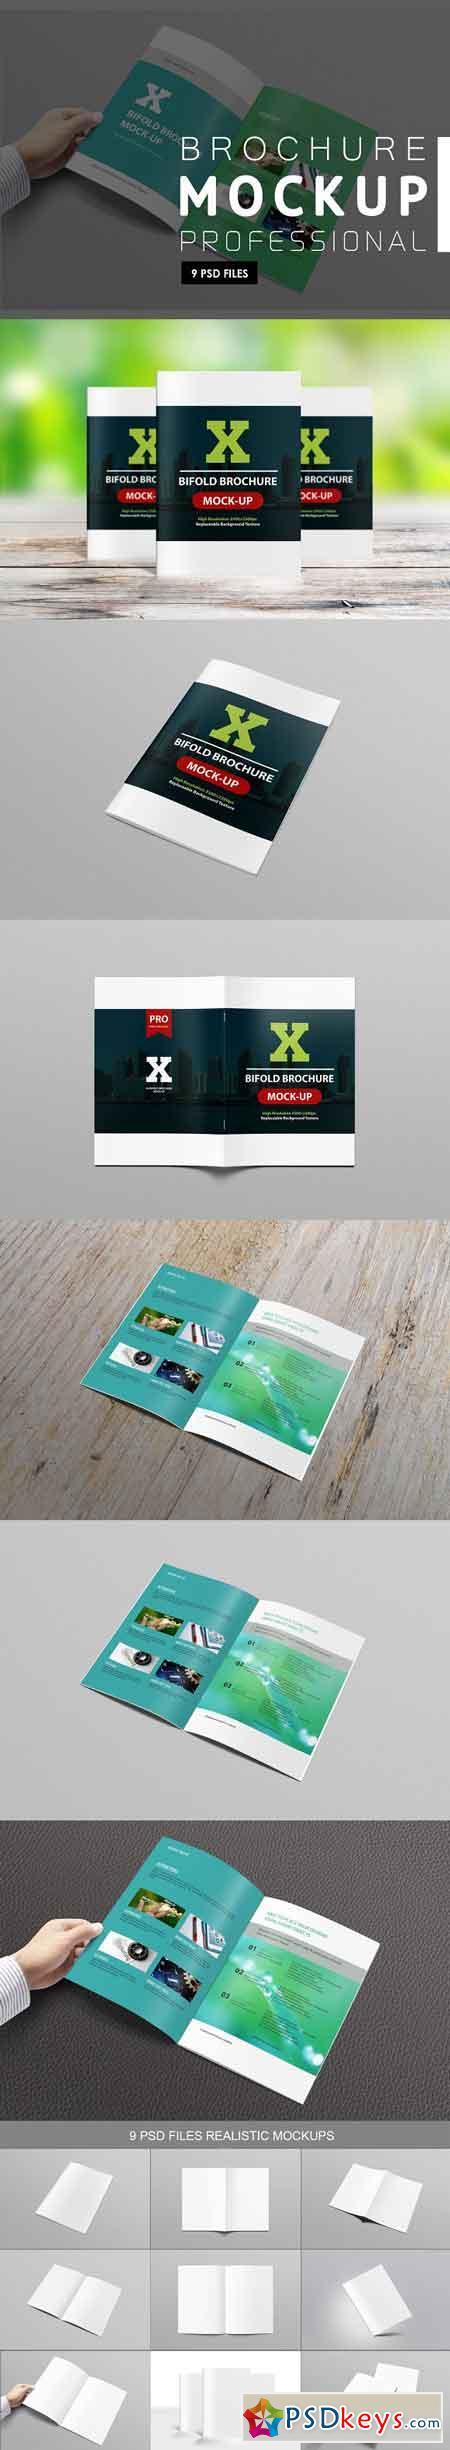 Brochure Mock-ups 3171014